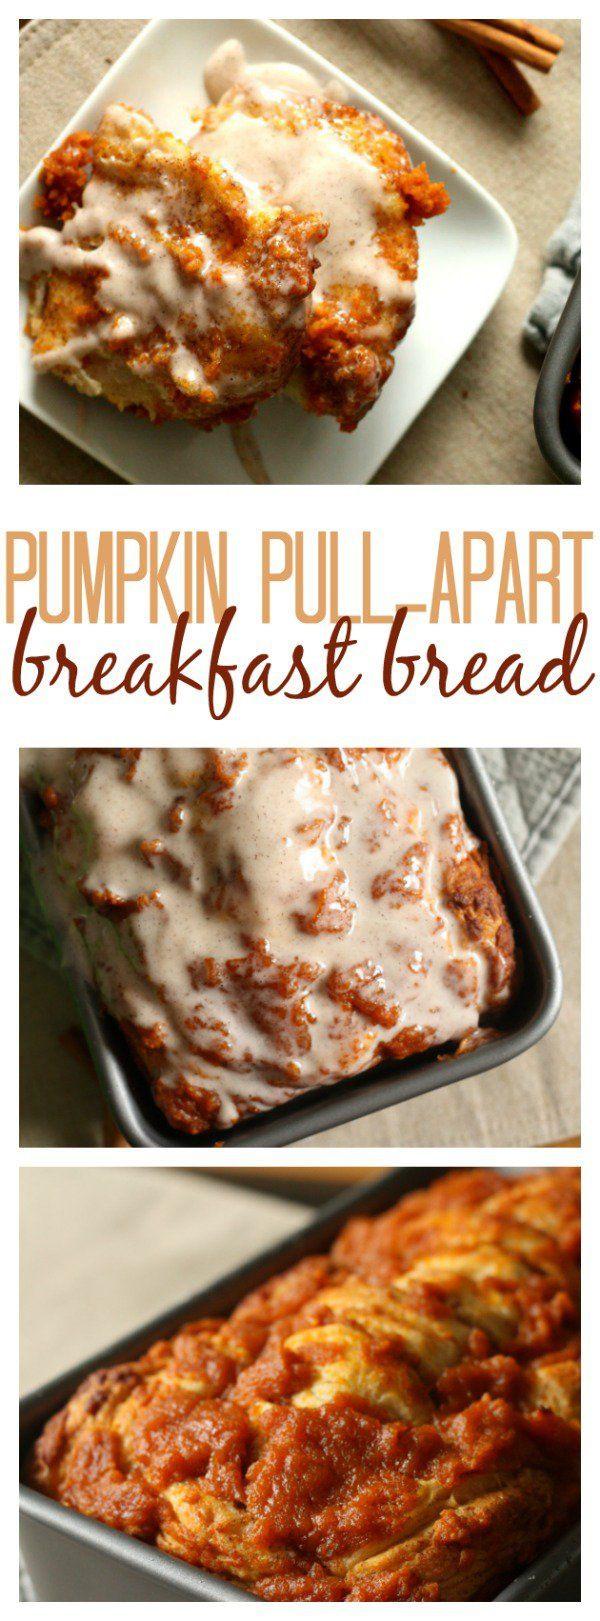 Pumpkin Breakfast Recipes  827 best images about Breads on Pinterest